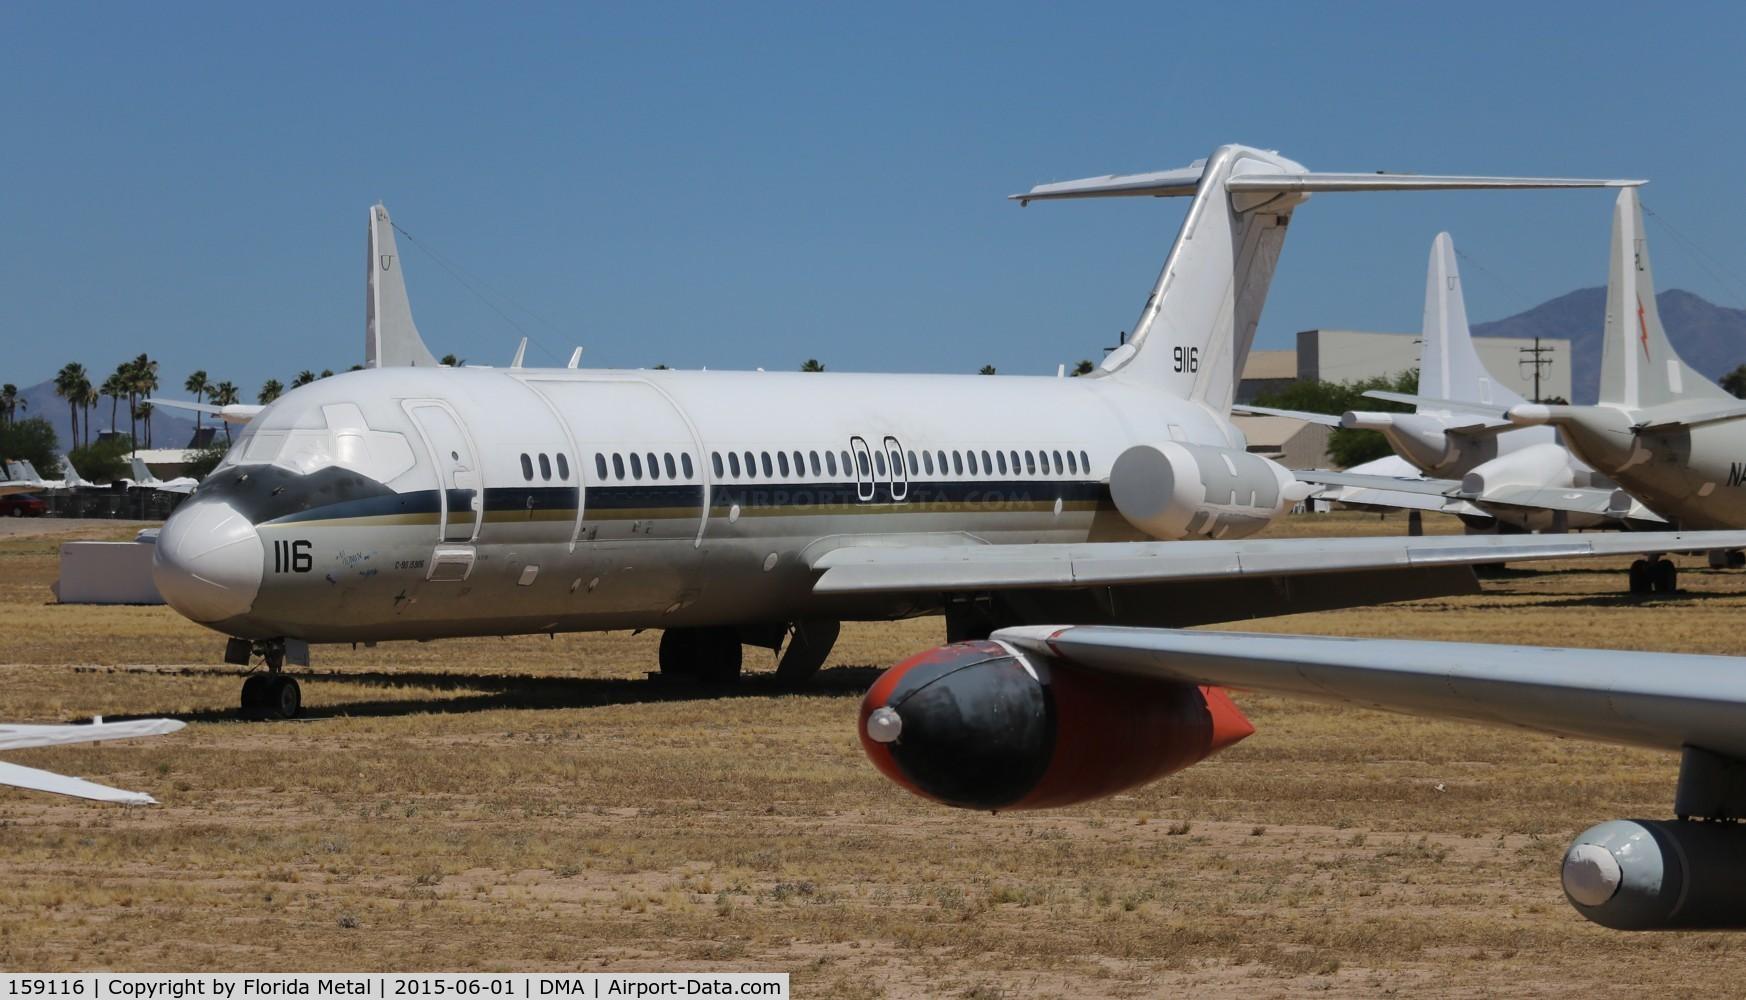 159116, 1973 McDonnell Douglas C-9B Skytrain II C/N 47580, Douglas C-9B